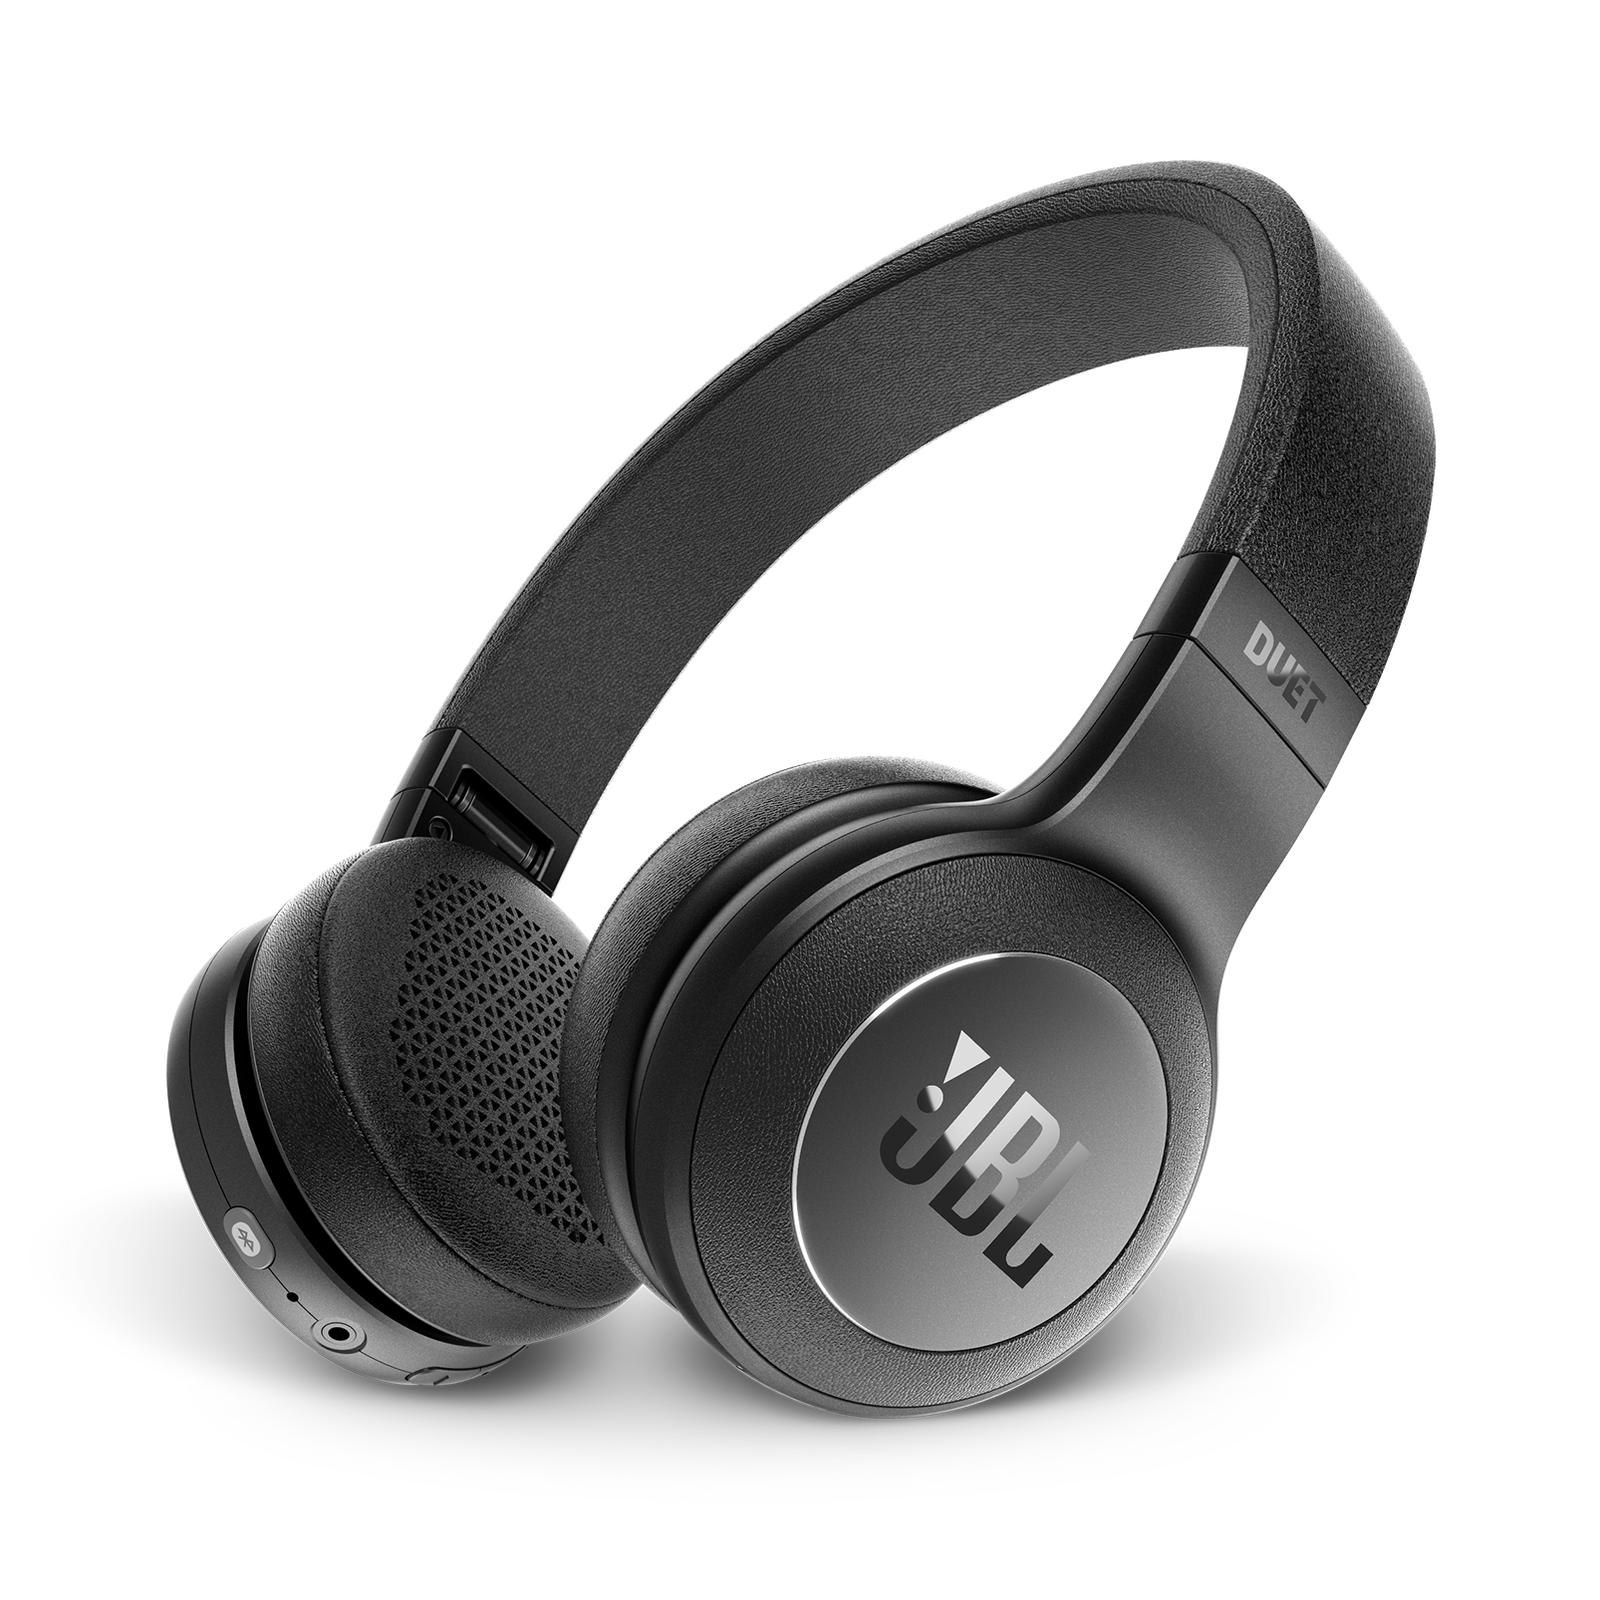 JBL Duet BT Wireless On-Ear Headphones with 16-Hour Battery 1